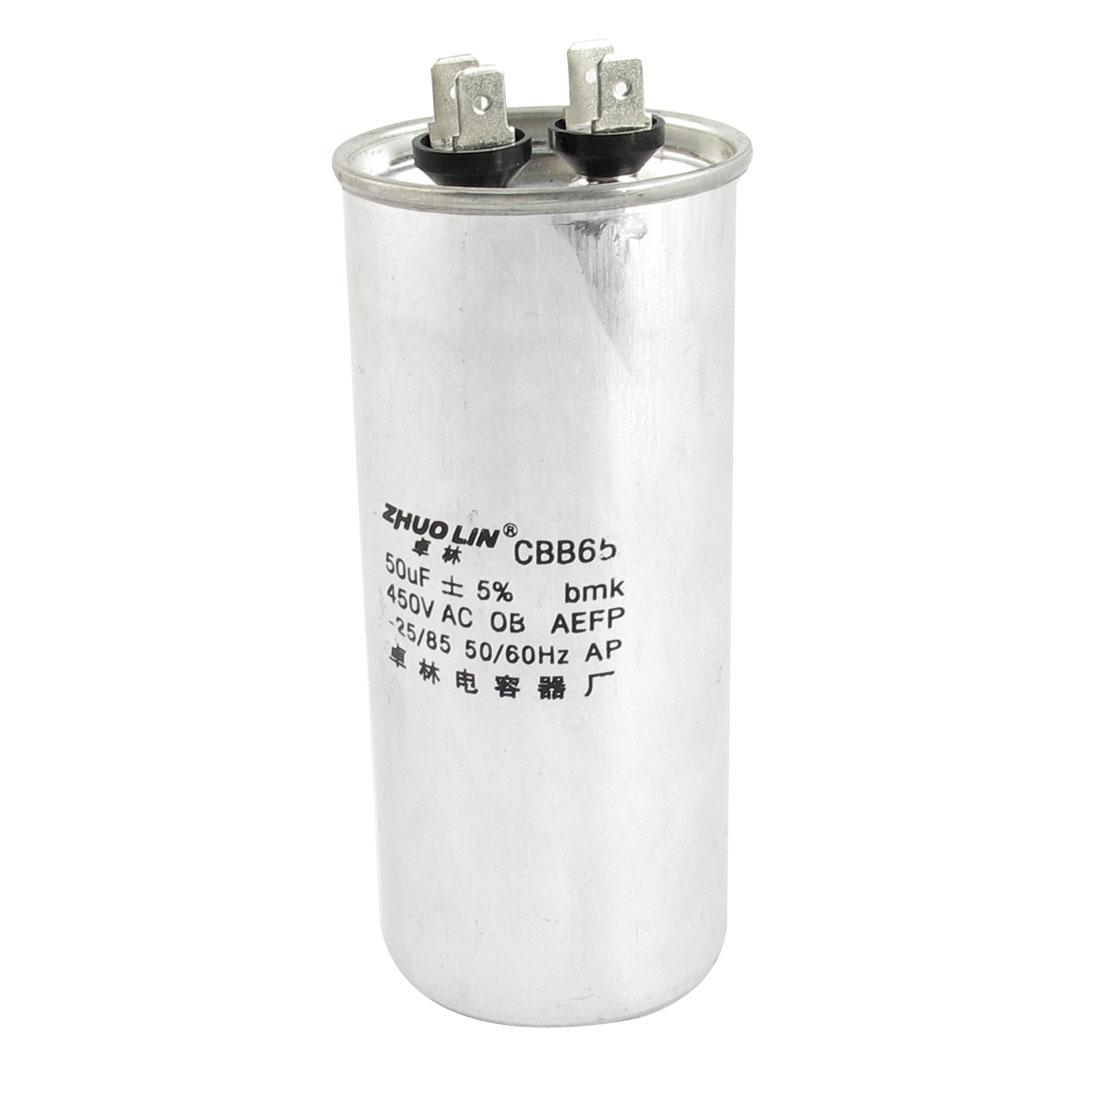 CBB65 AC 450V 50uF Capacitance 5% Tolerance Non Polar Polypropylene Film Motor Running Capacitor for Air Conditioner